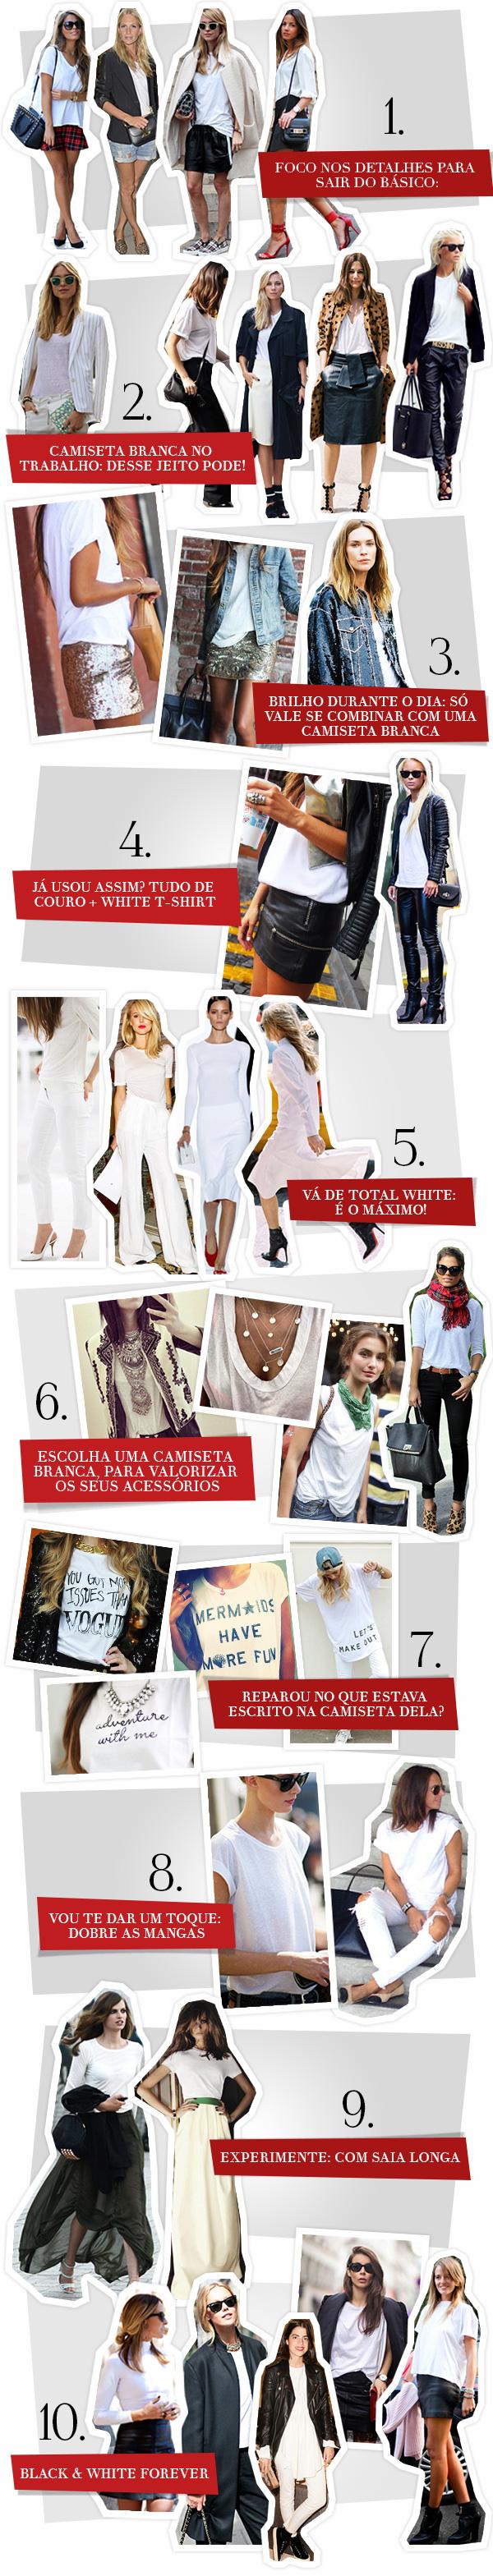 blog-da-alice-ferraz-camiseta-branca-como-usar